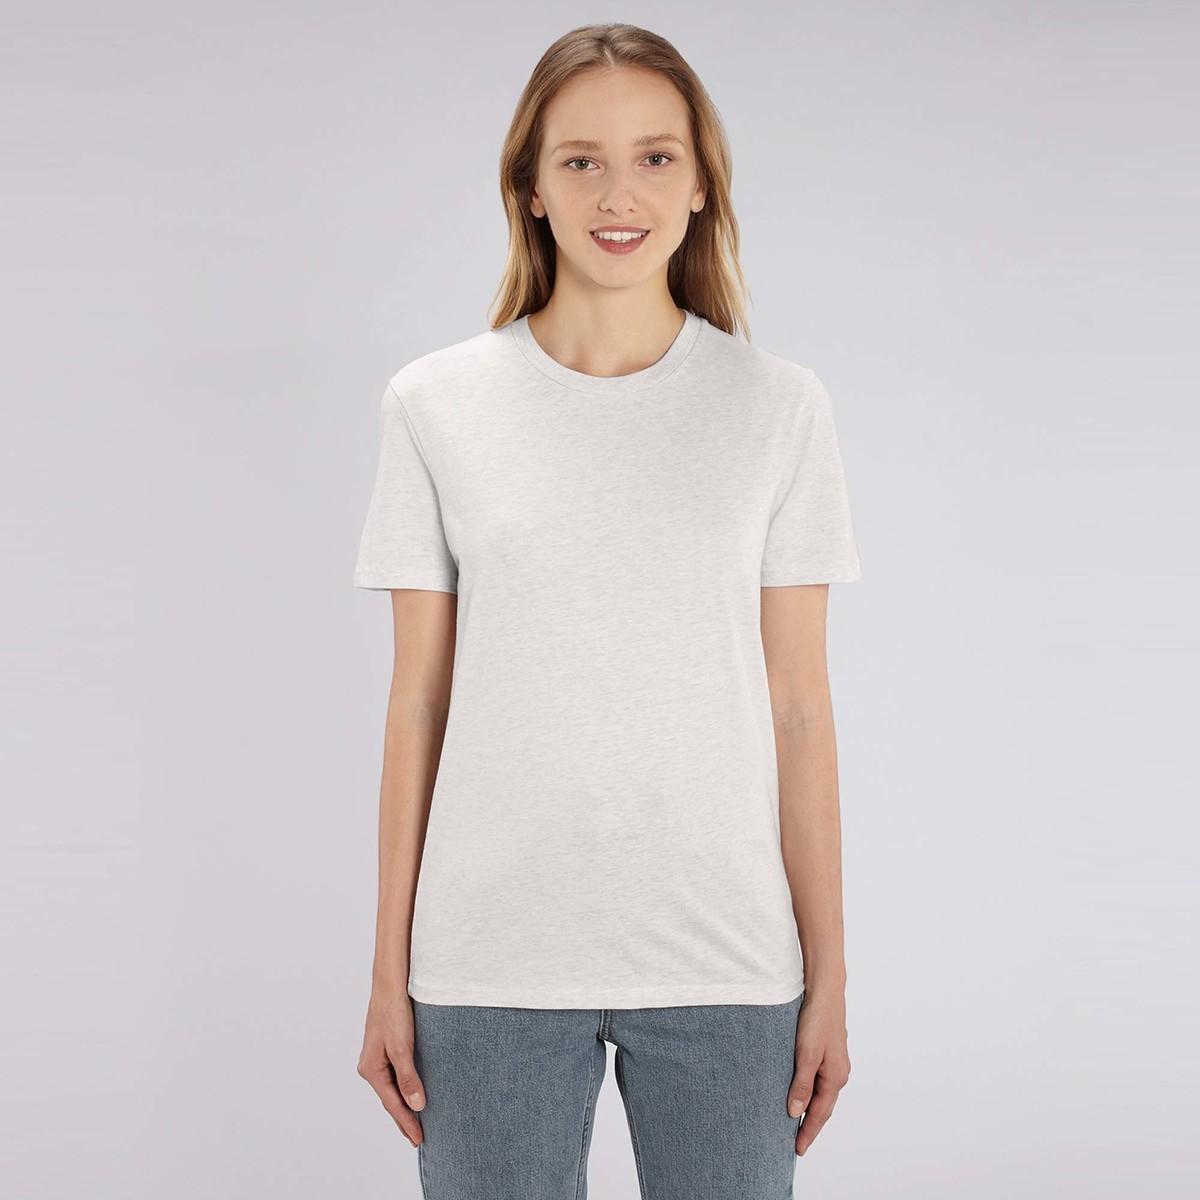 shirt Holbox Made In Bio T MVLSzpGqU